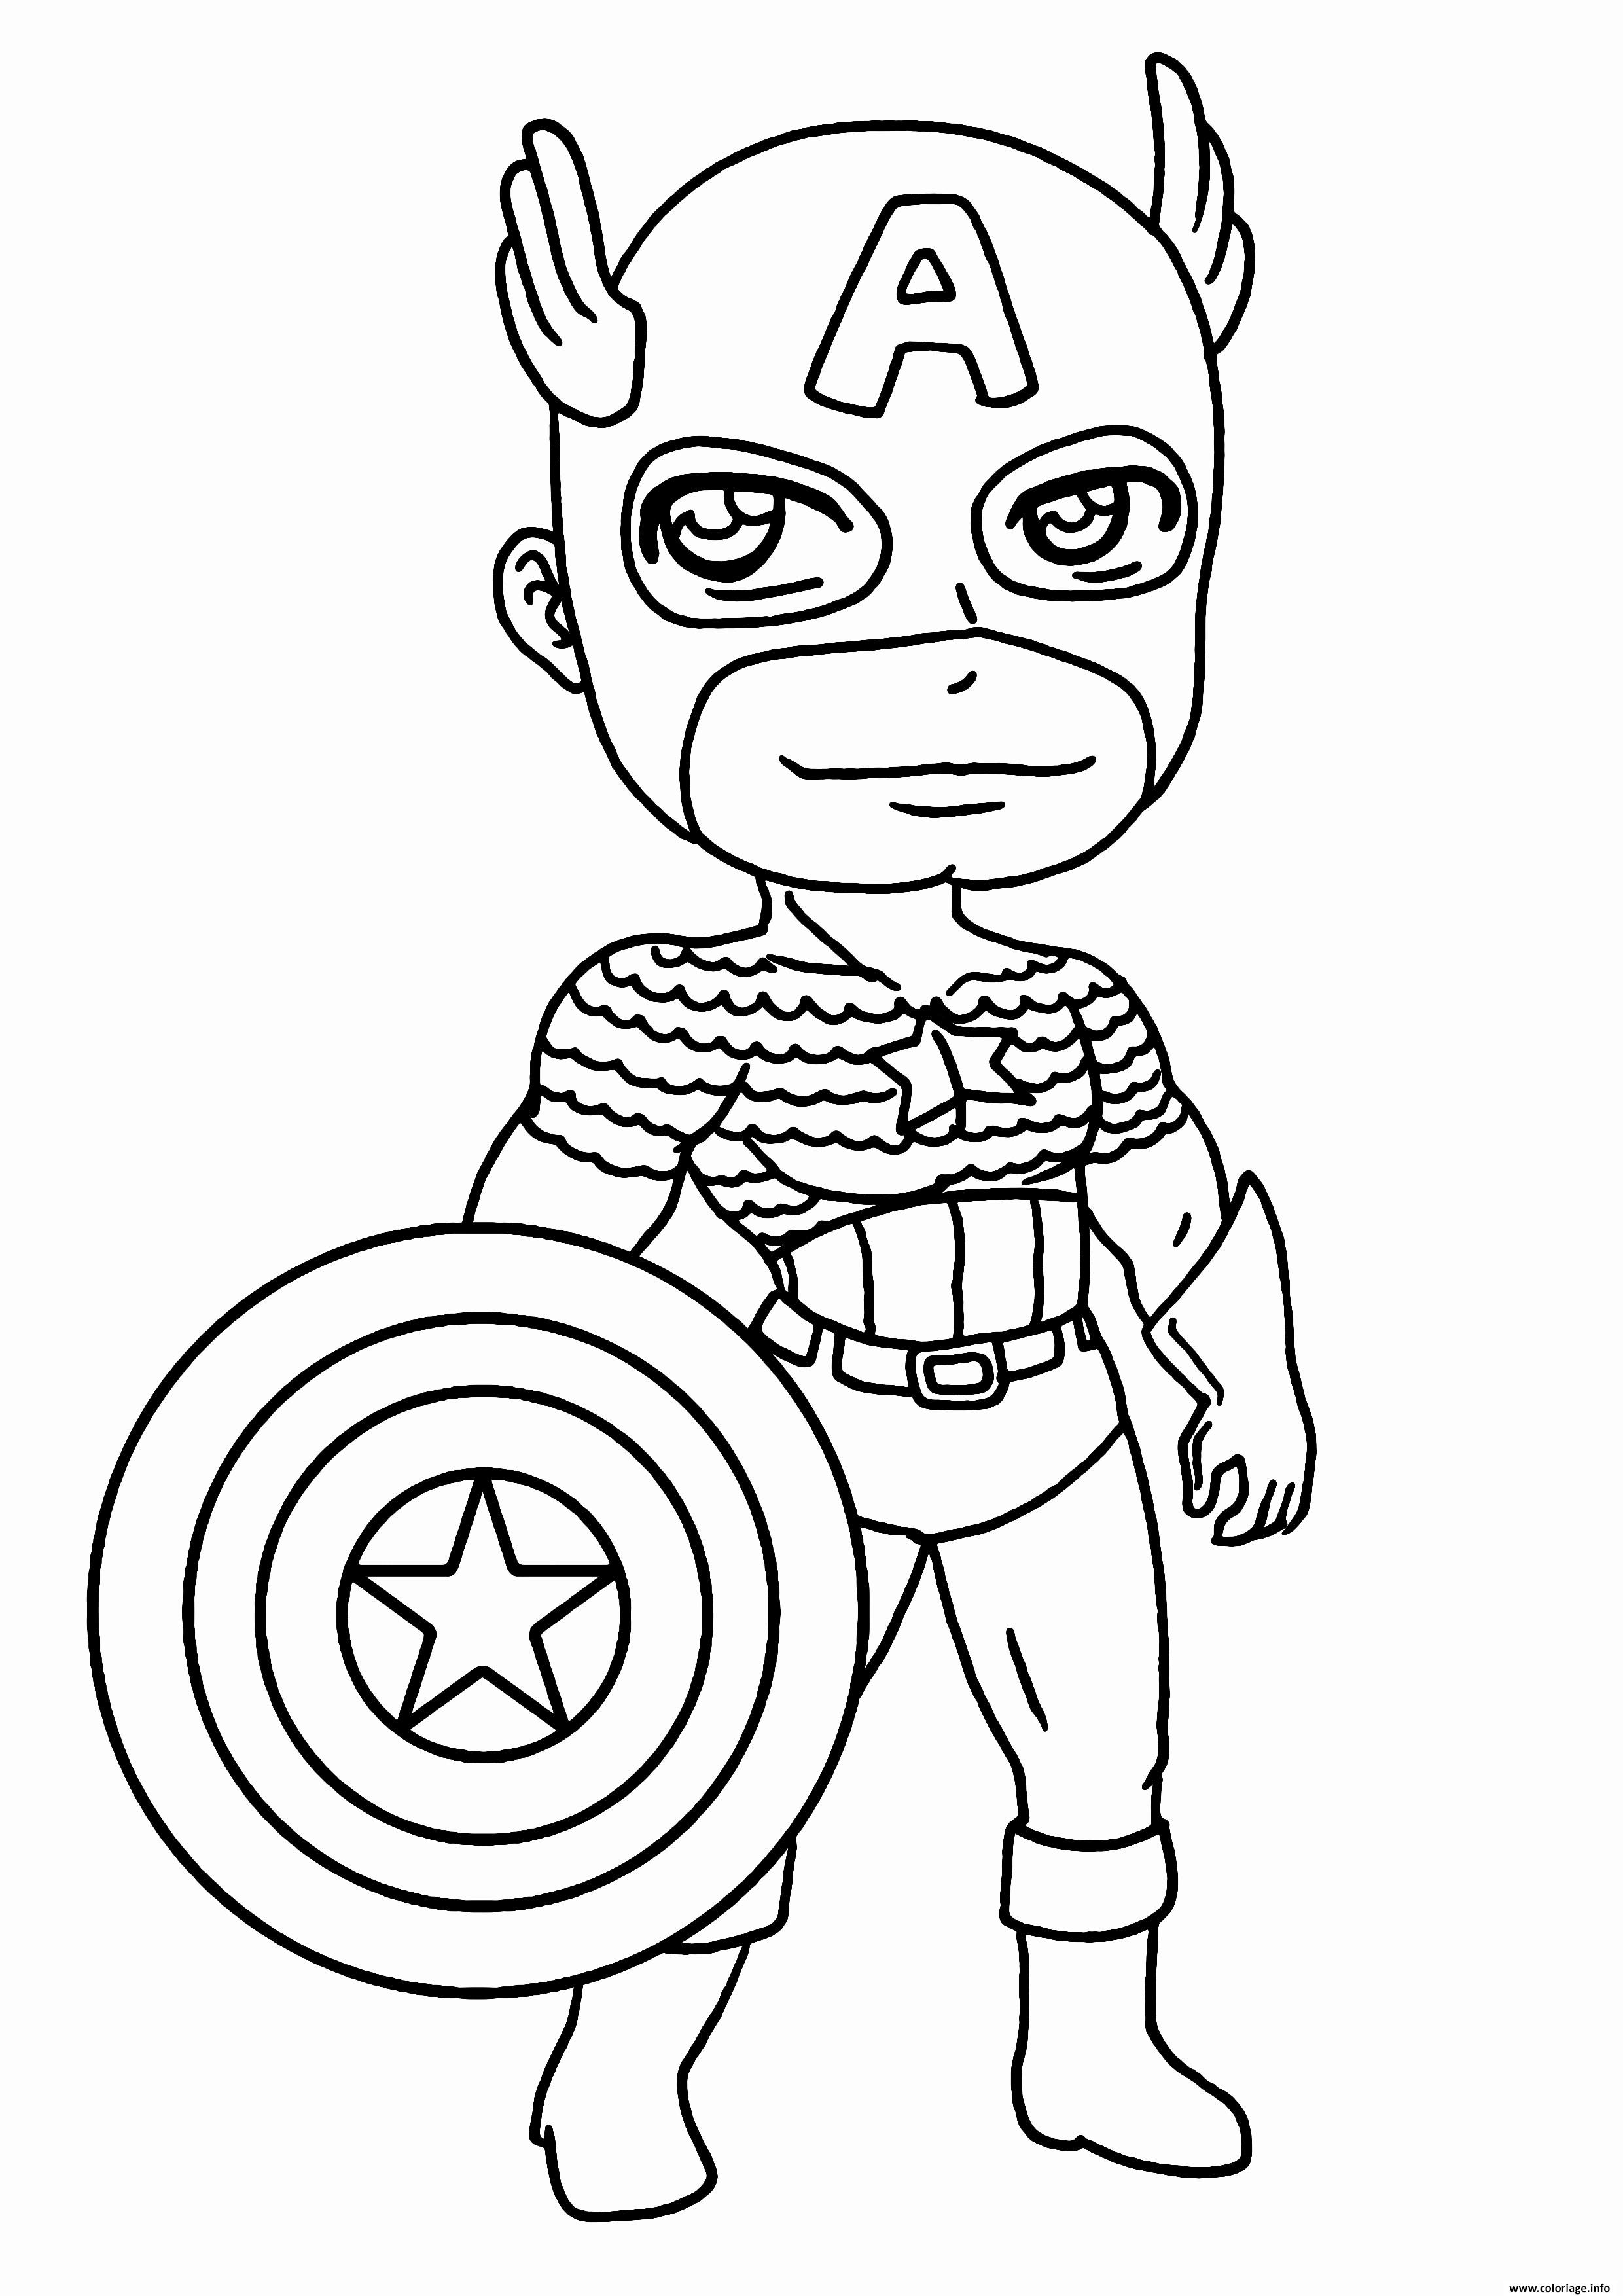 Coloriage Garcon Super Heros Capitaine America Jecolorie Com